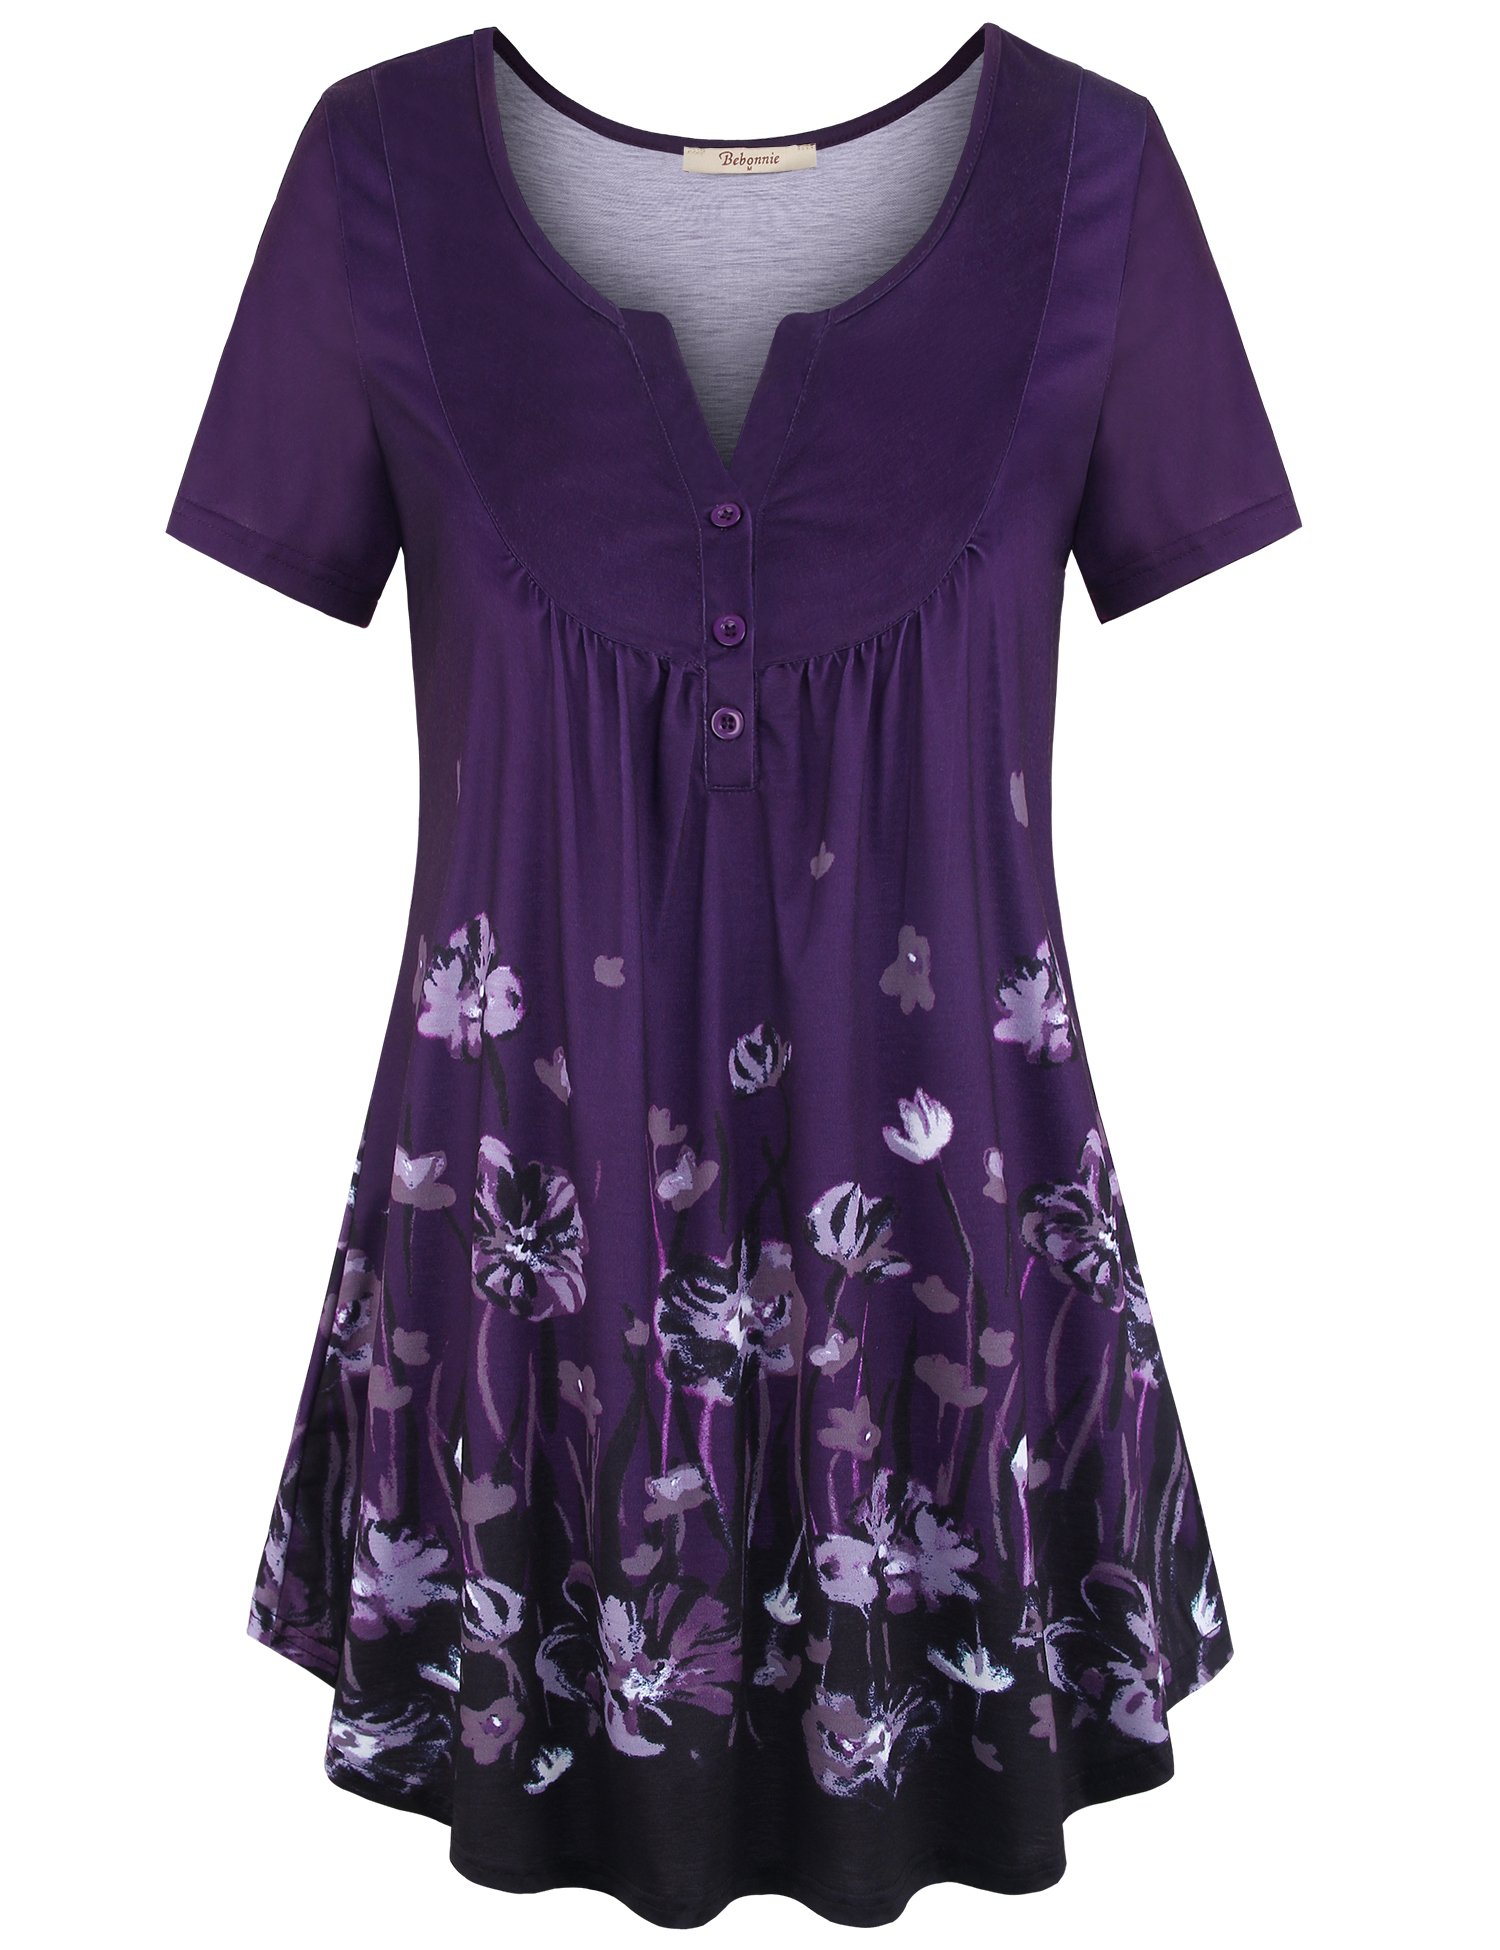 Bebonnie Women's Vintage Short Sleeve V Neck Pleated Tunic Shirt Multicolor Violet XXXL